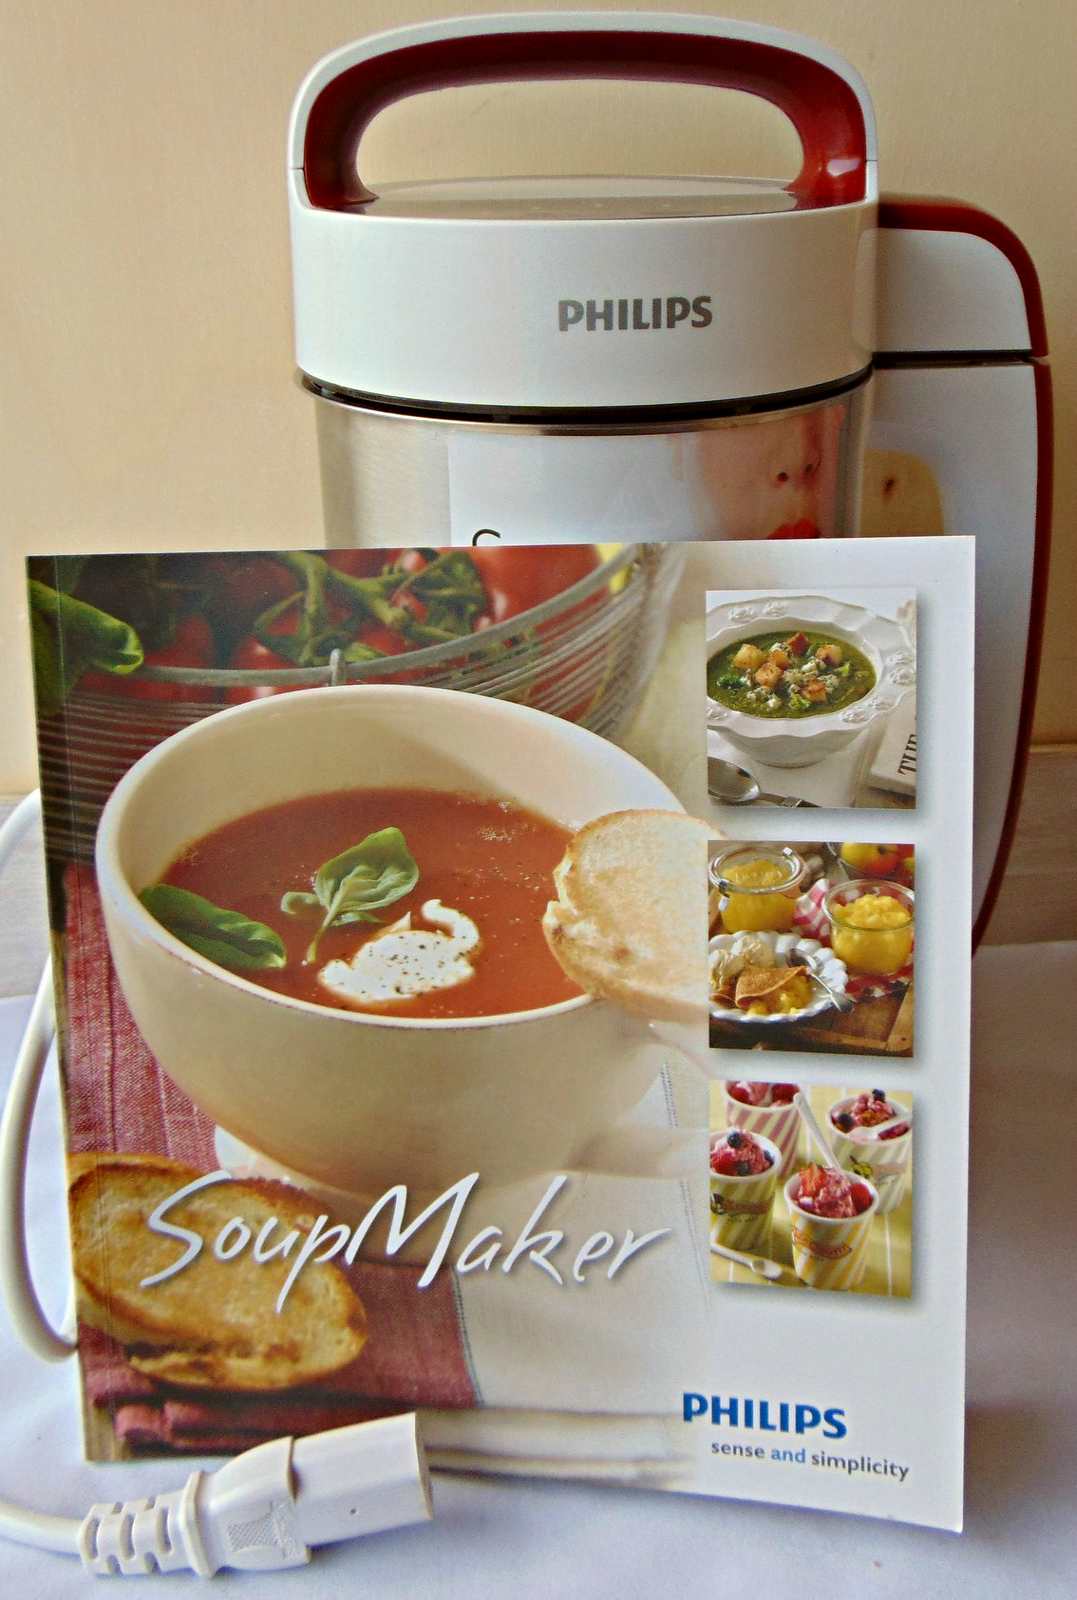 Soup maker philips semplicit in cucina recensione - Soup maker philips video ...